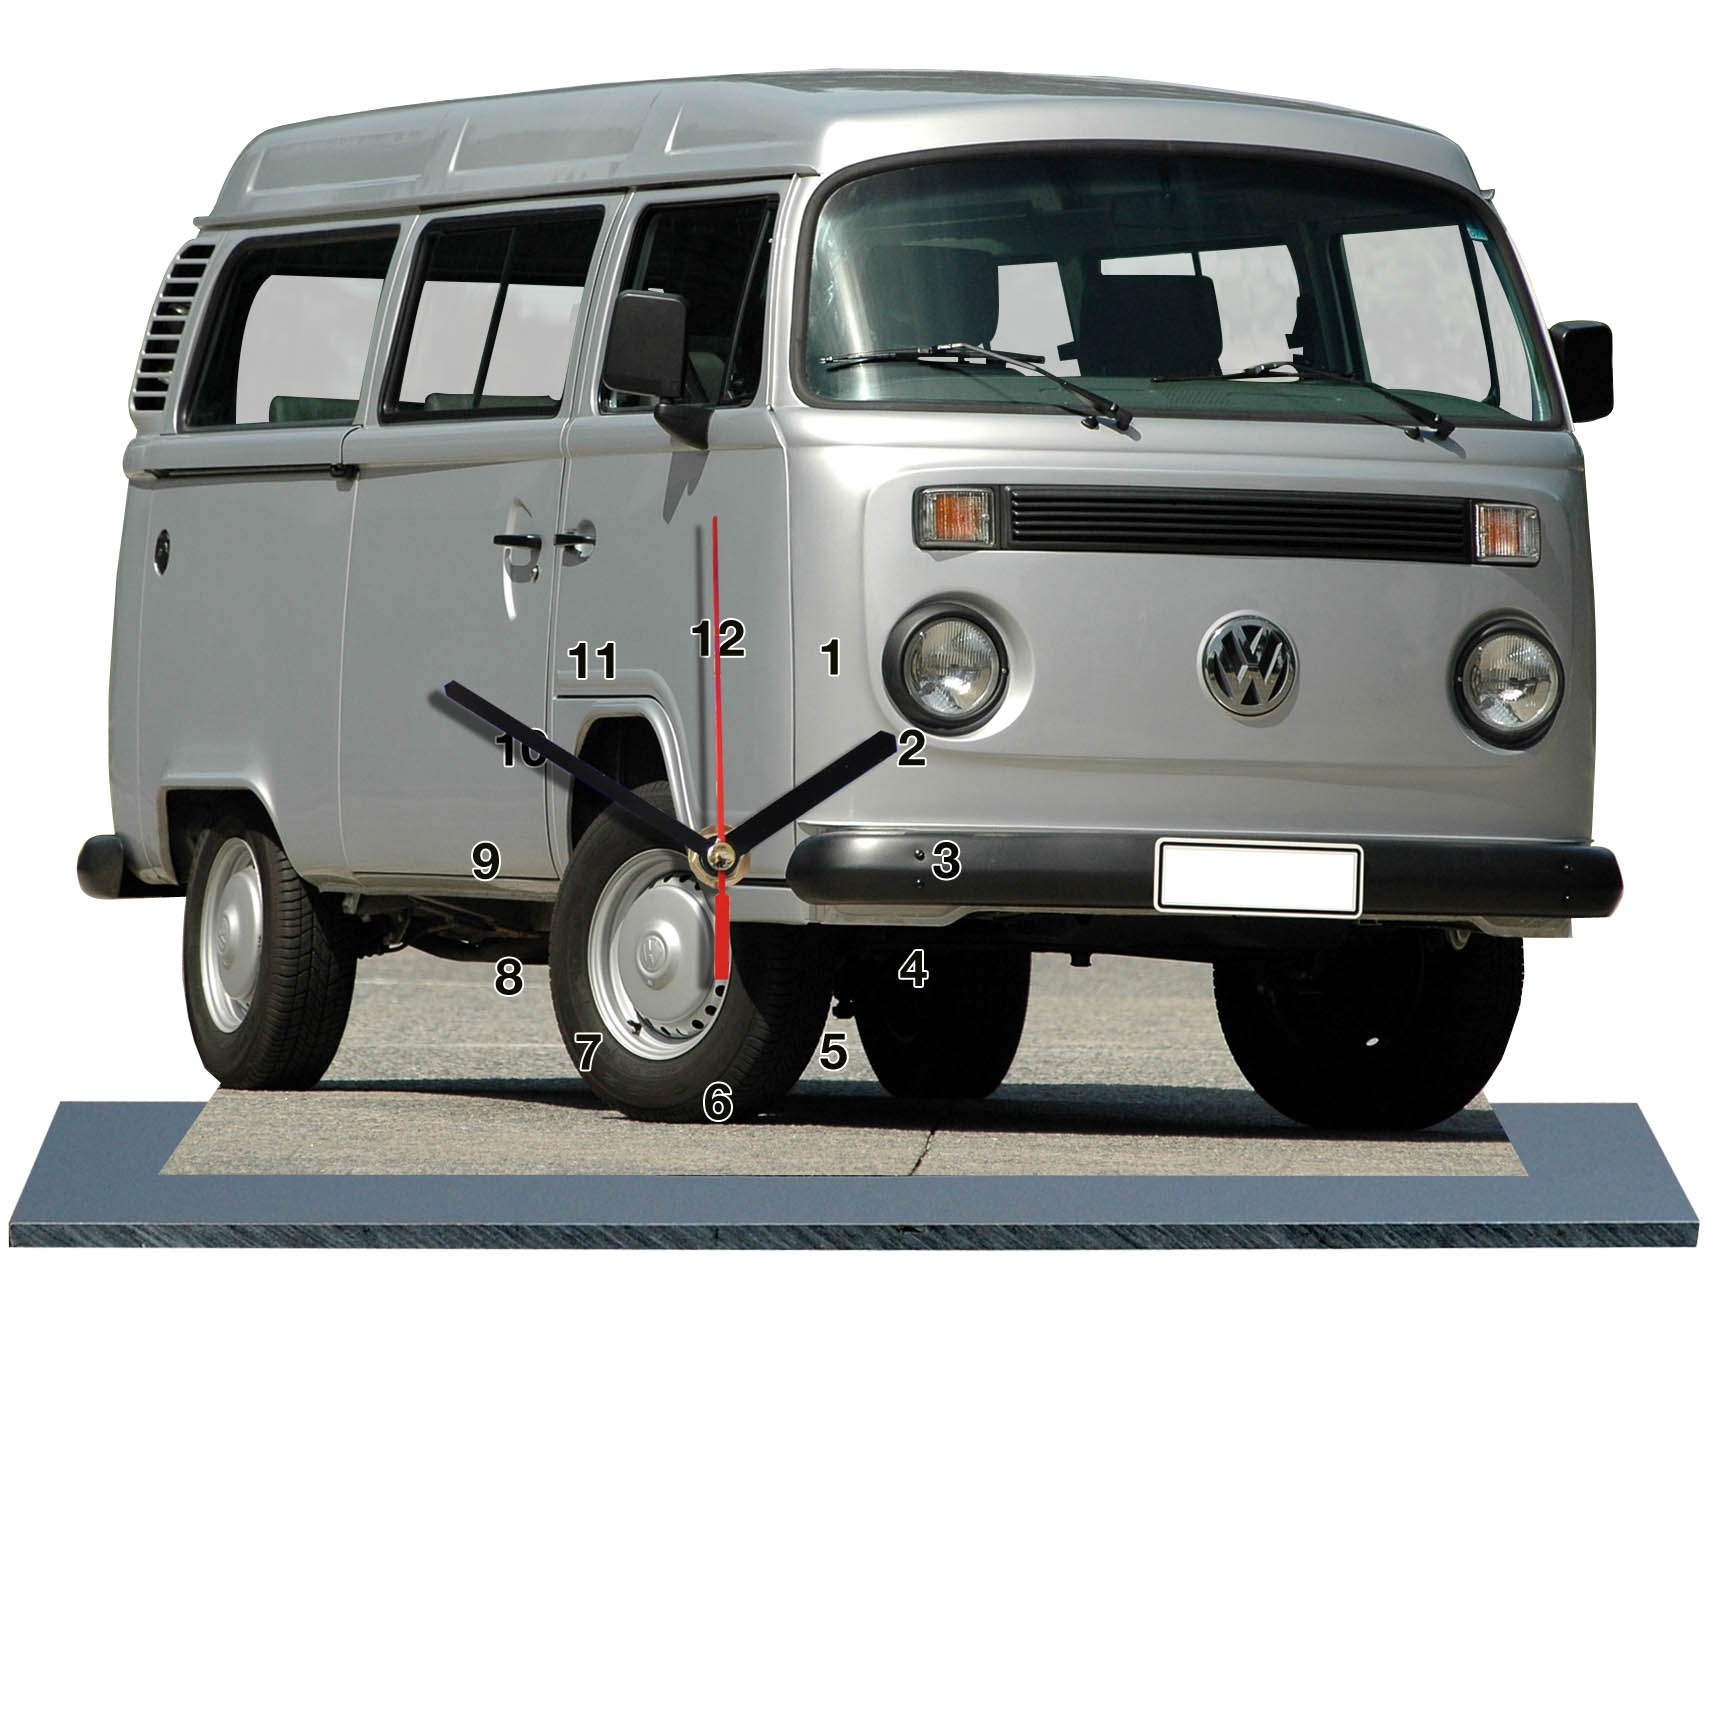 volkswagen vw combi t2 1967 en horloge miniature sur socle. Black Bedroom Furniture Sets. Home Design Ideas